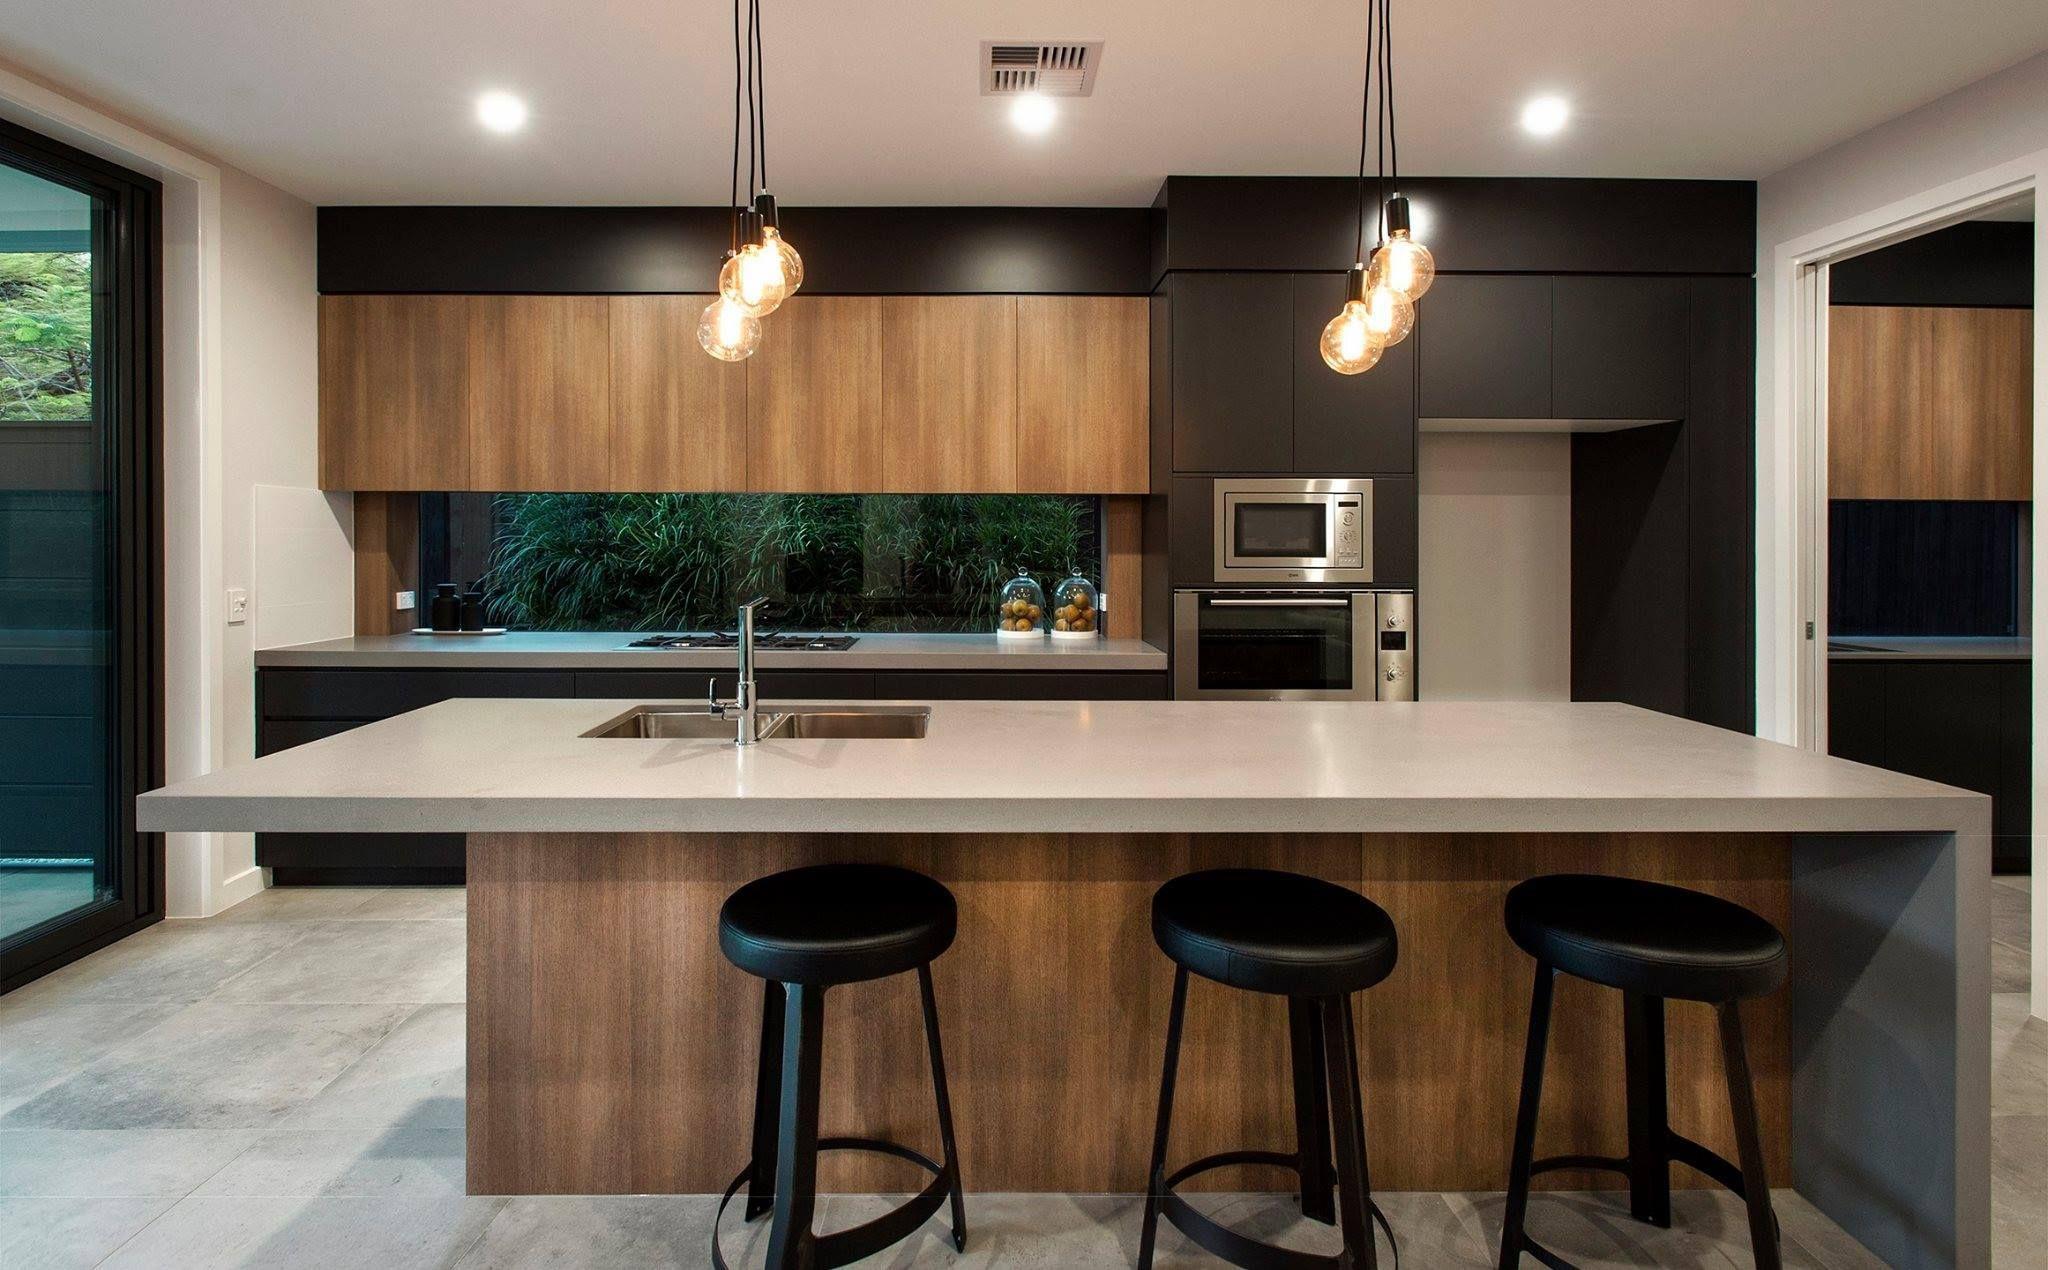 Keuken Bar Ideeen : Keuken huisdesign in keuken keuken ideeën en